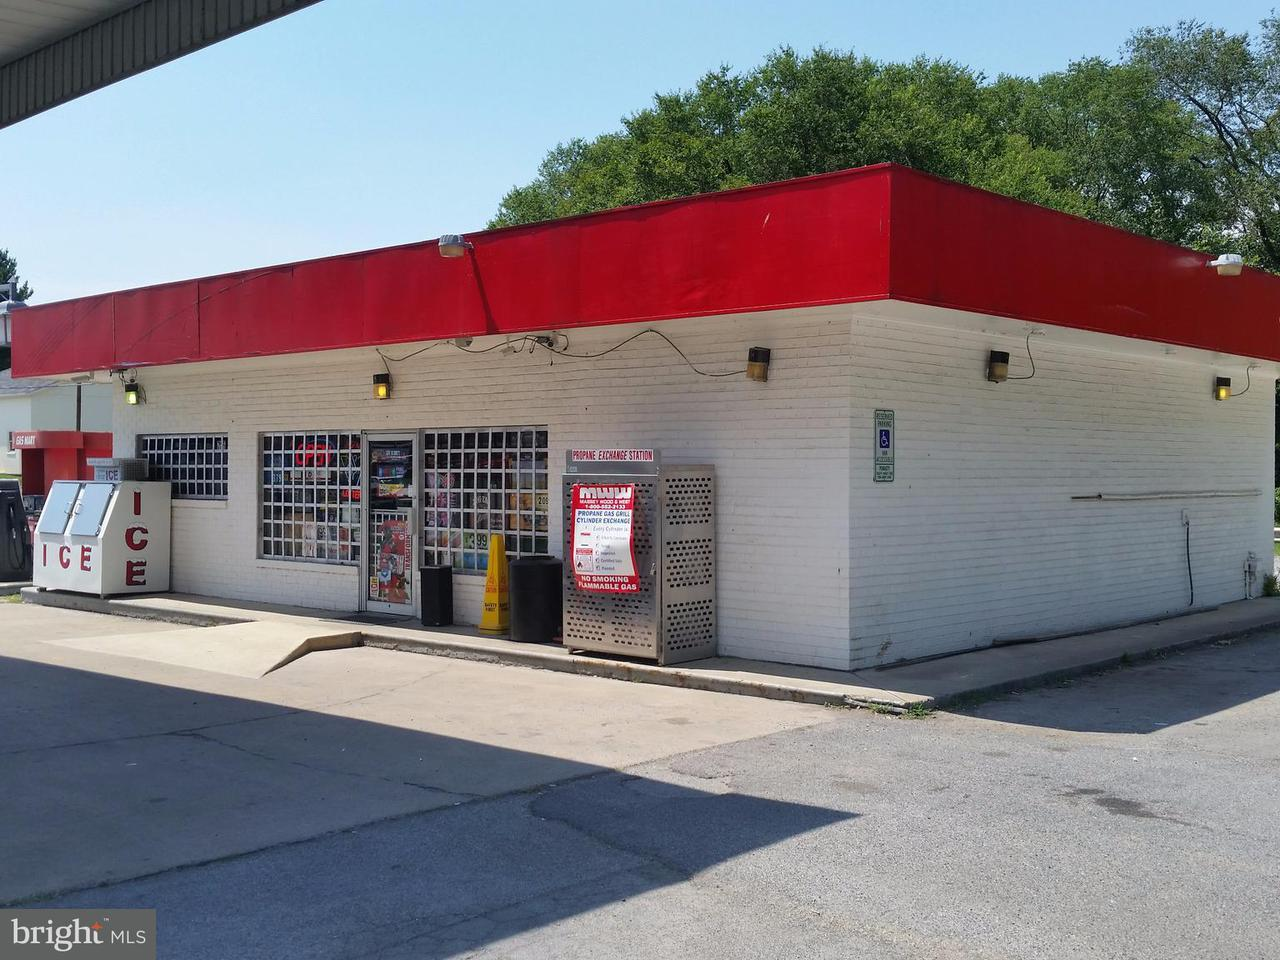 Additional photo for property listing at 725 MAIN ST E 725 MAIN ST E Luray, Virginia 22835 Verenigde Staten